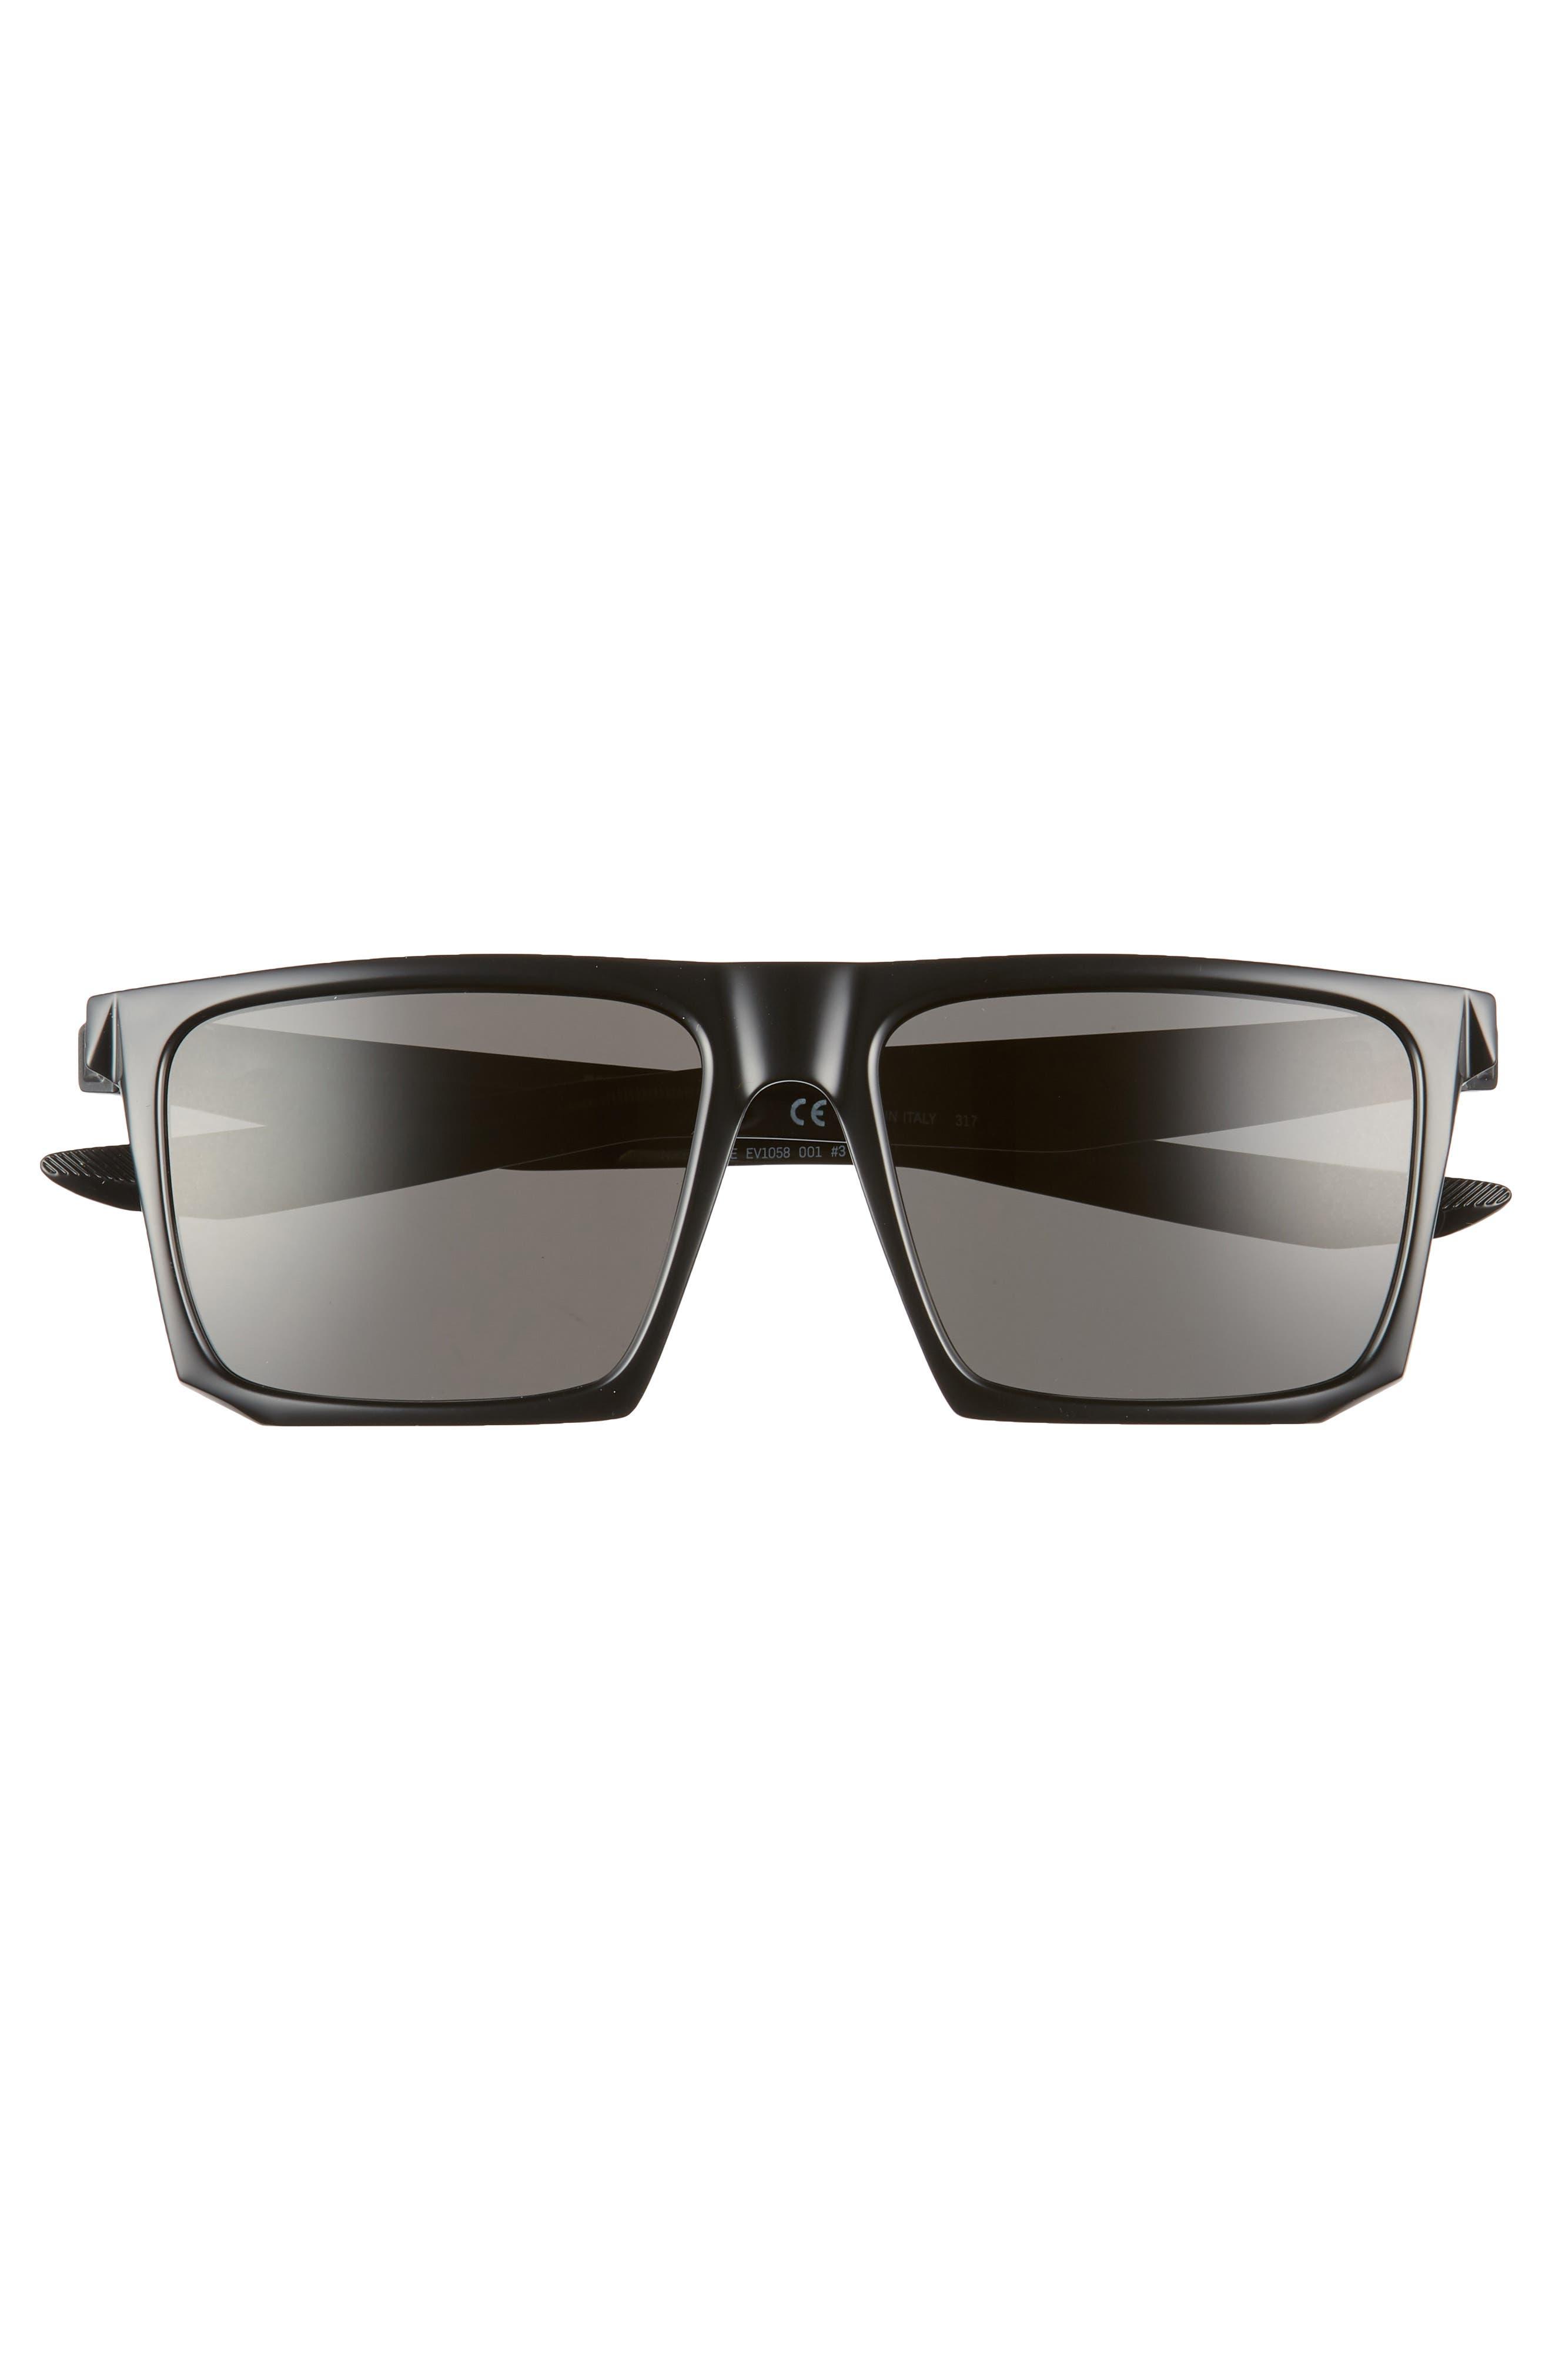 Ledge 56mm Sunglasses,                             Alternate thumbnail 2, color,                             BLACK/ DARK GREY